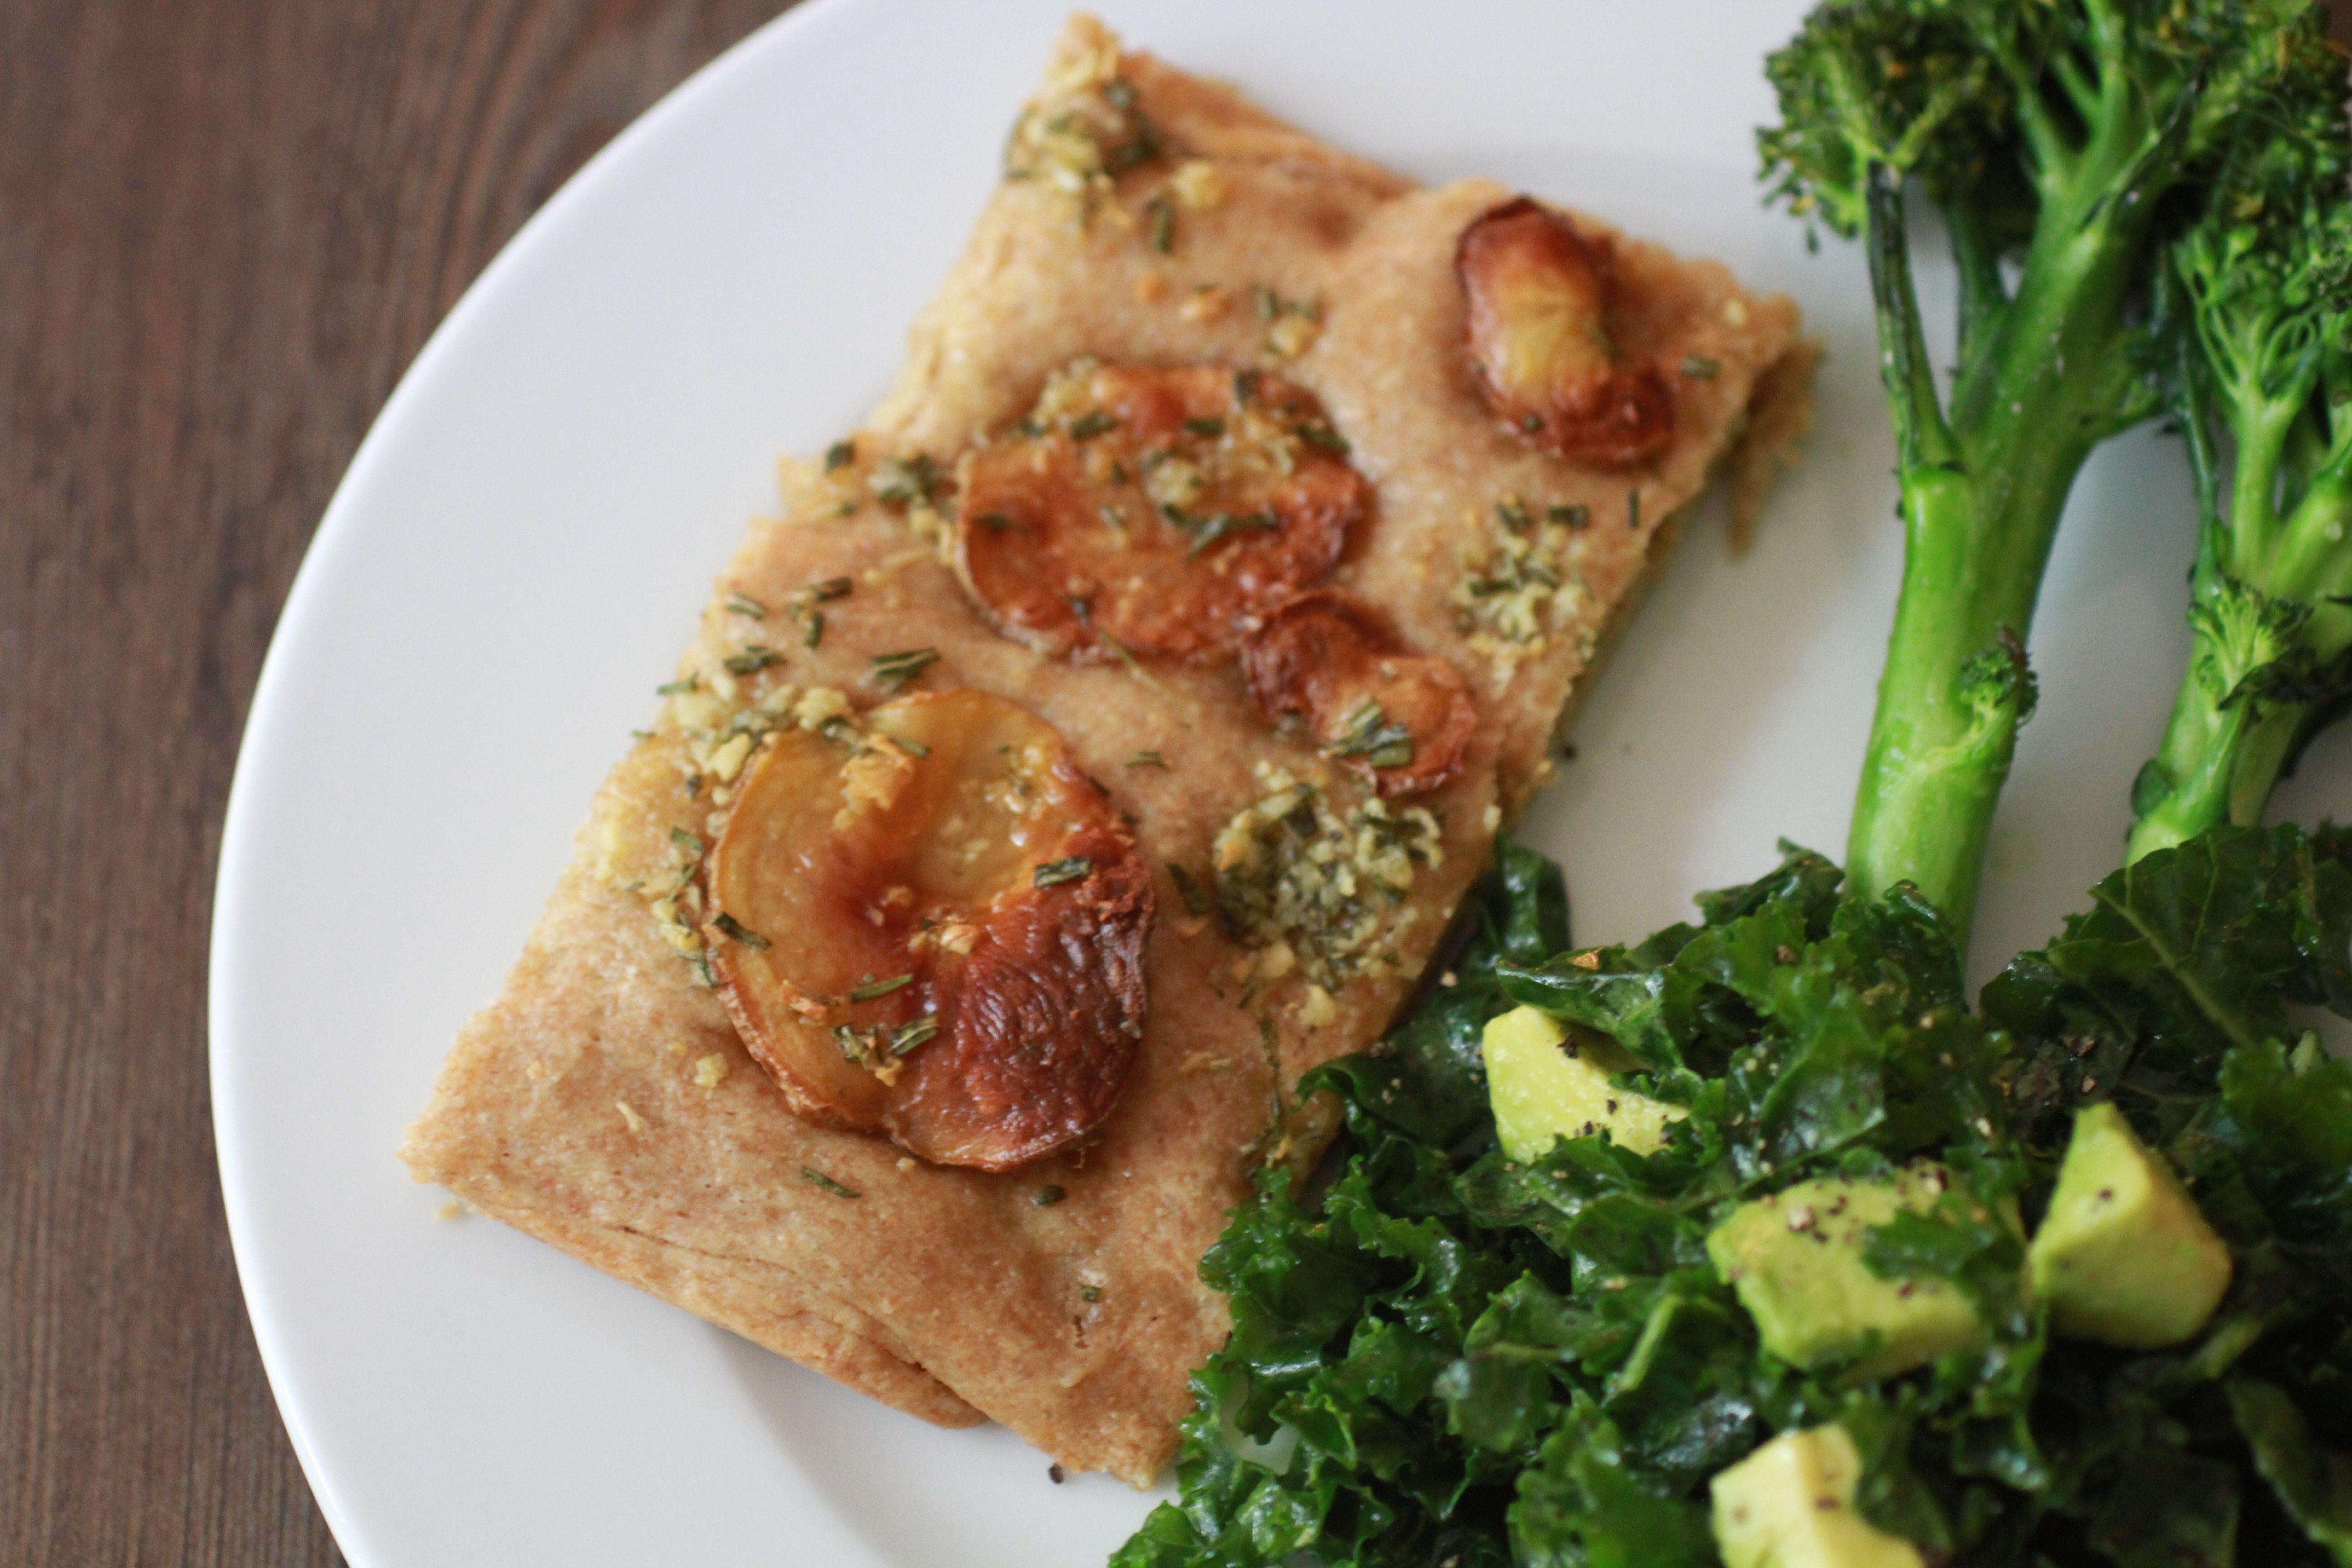 Potato, Rosemary and Garlic Focaccia | WeeklyGreens.com